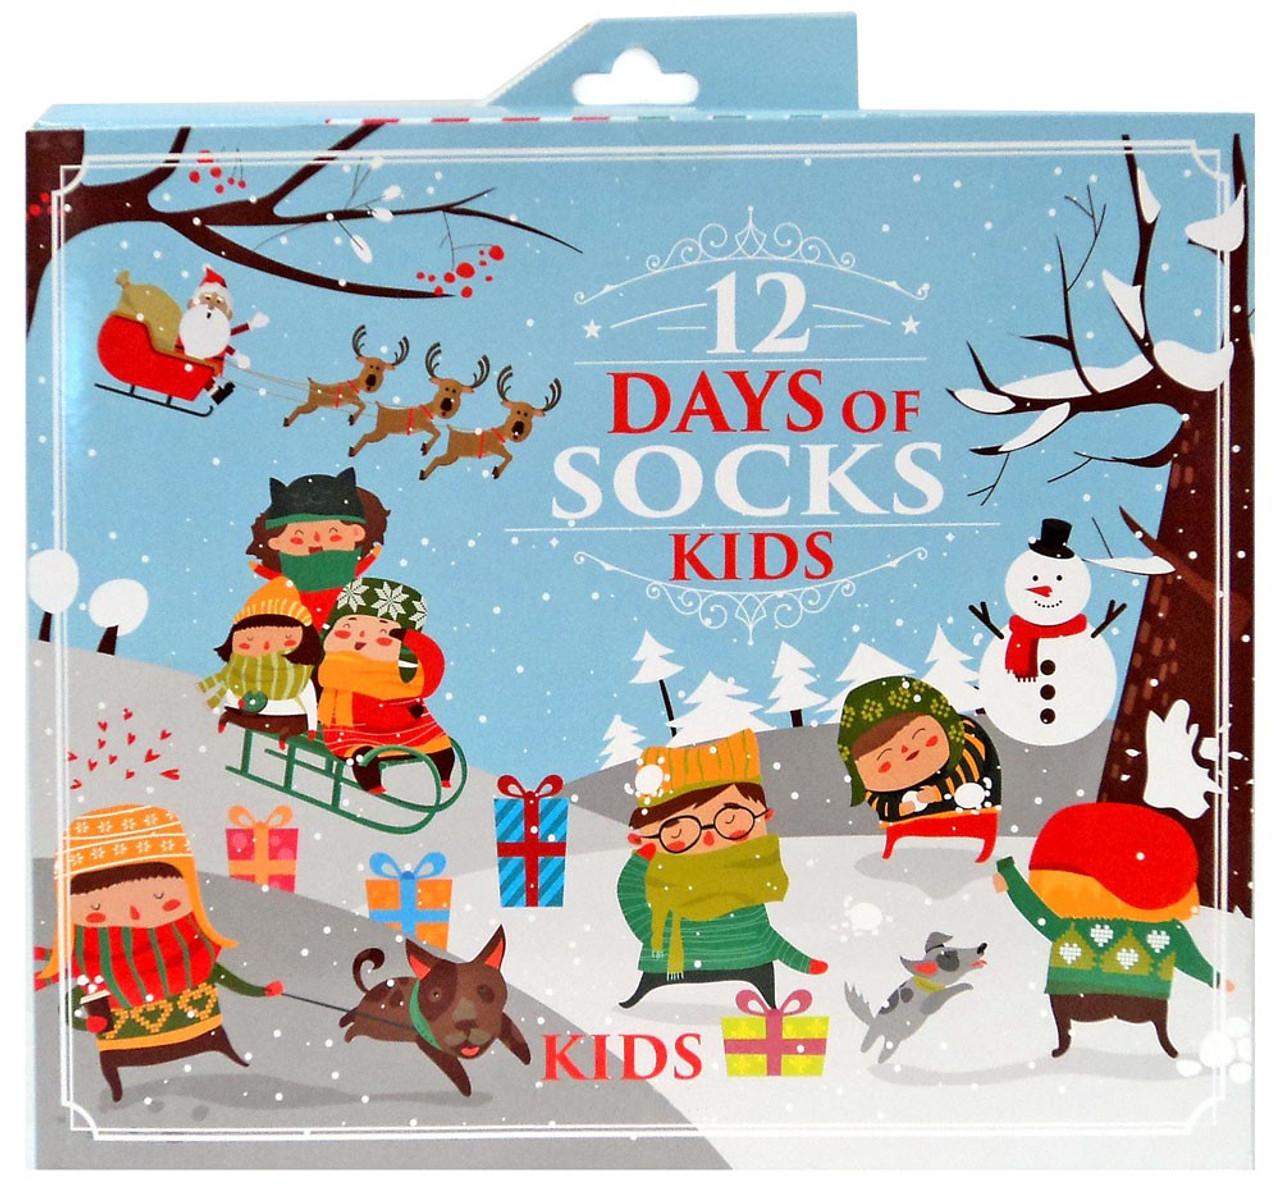 12 Days Of Christmas Socks.Boys 12 Days Of Socks 12 Pack Sock Size 6 8 5 Fits Shoe Size 9 3